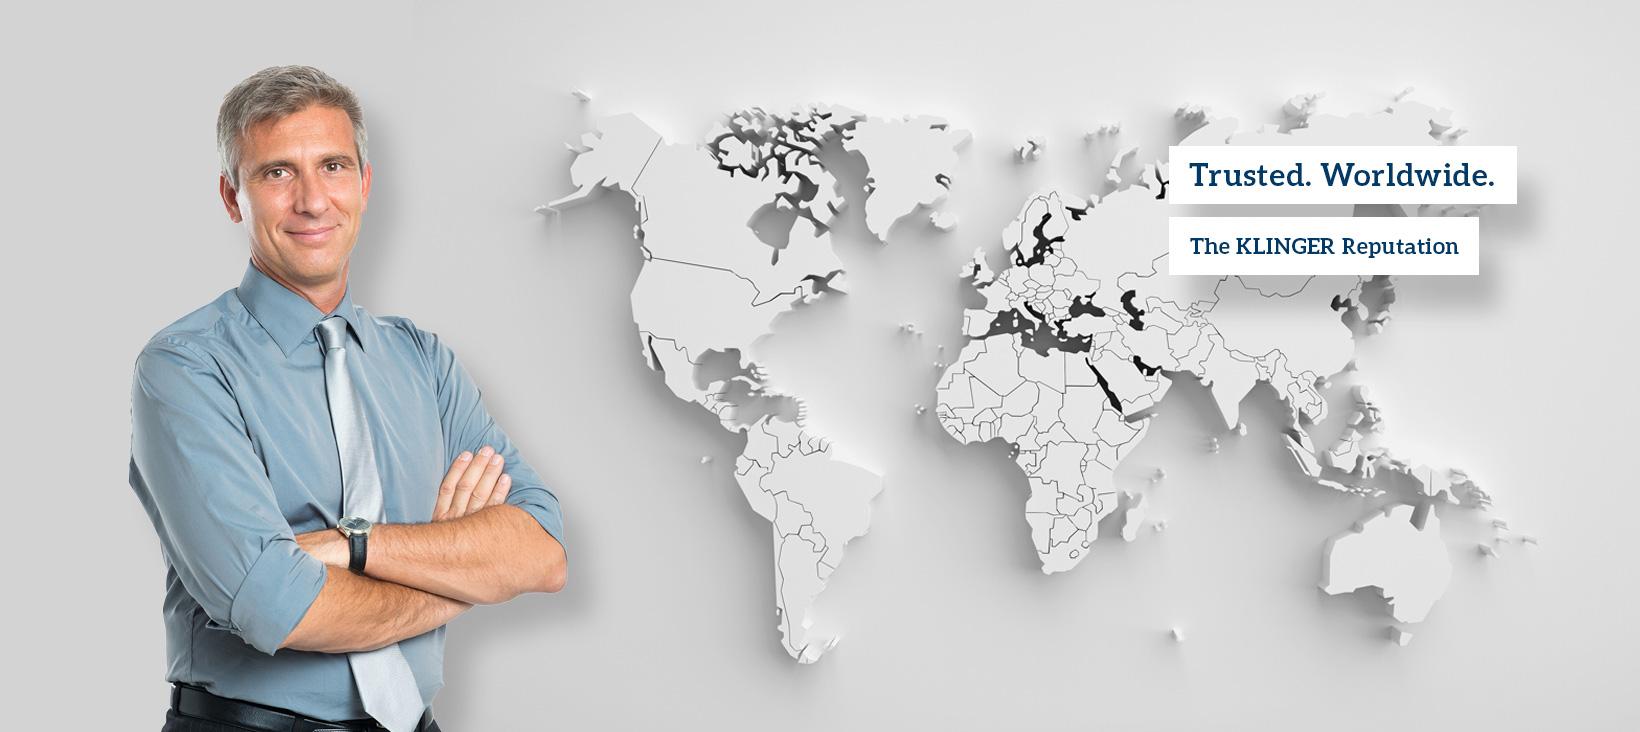 The Klinger Reputation | Trusted. Worldwide.